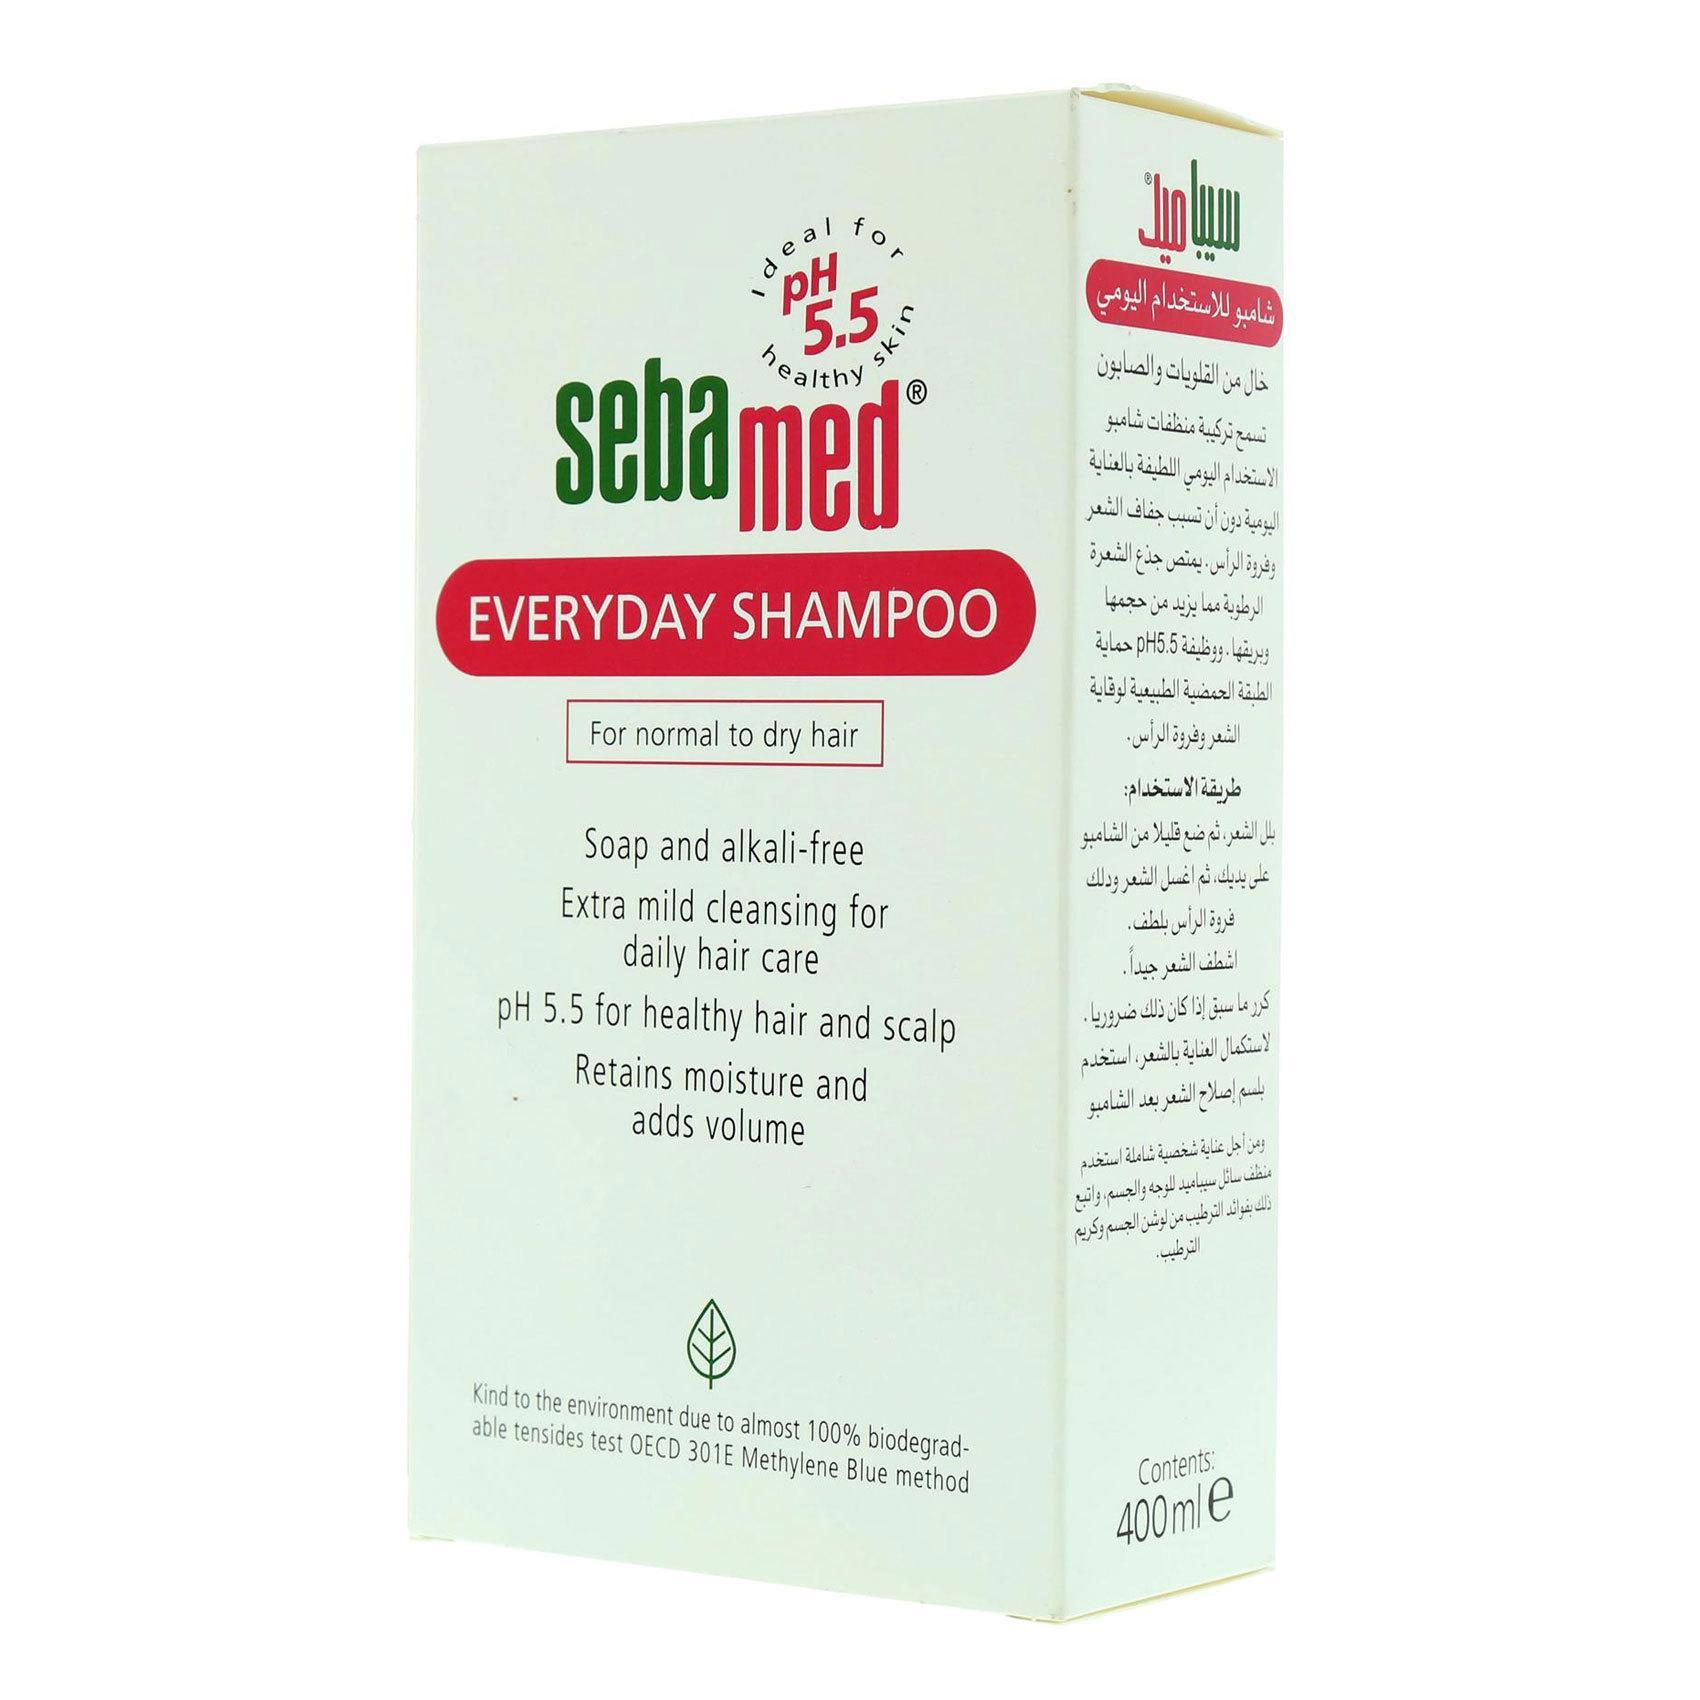 SEBAMED SHAMPOO EVERYDAY 400ML